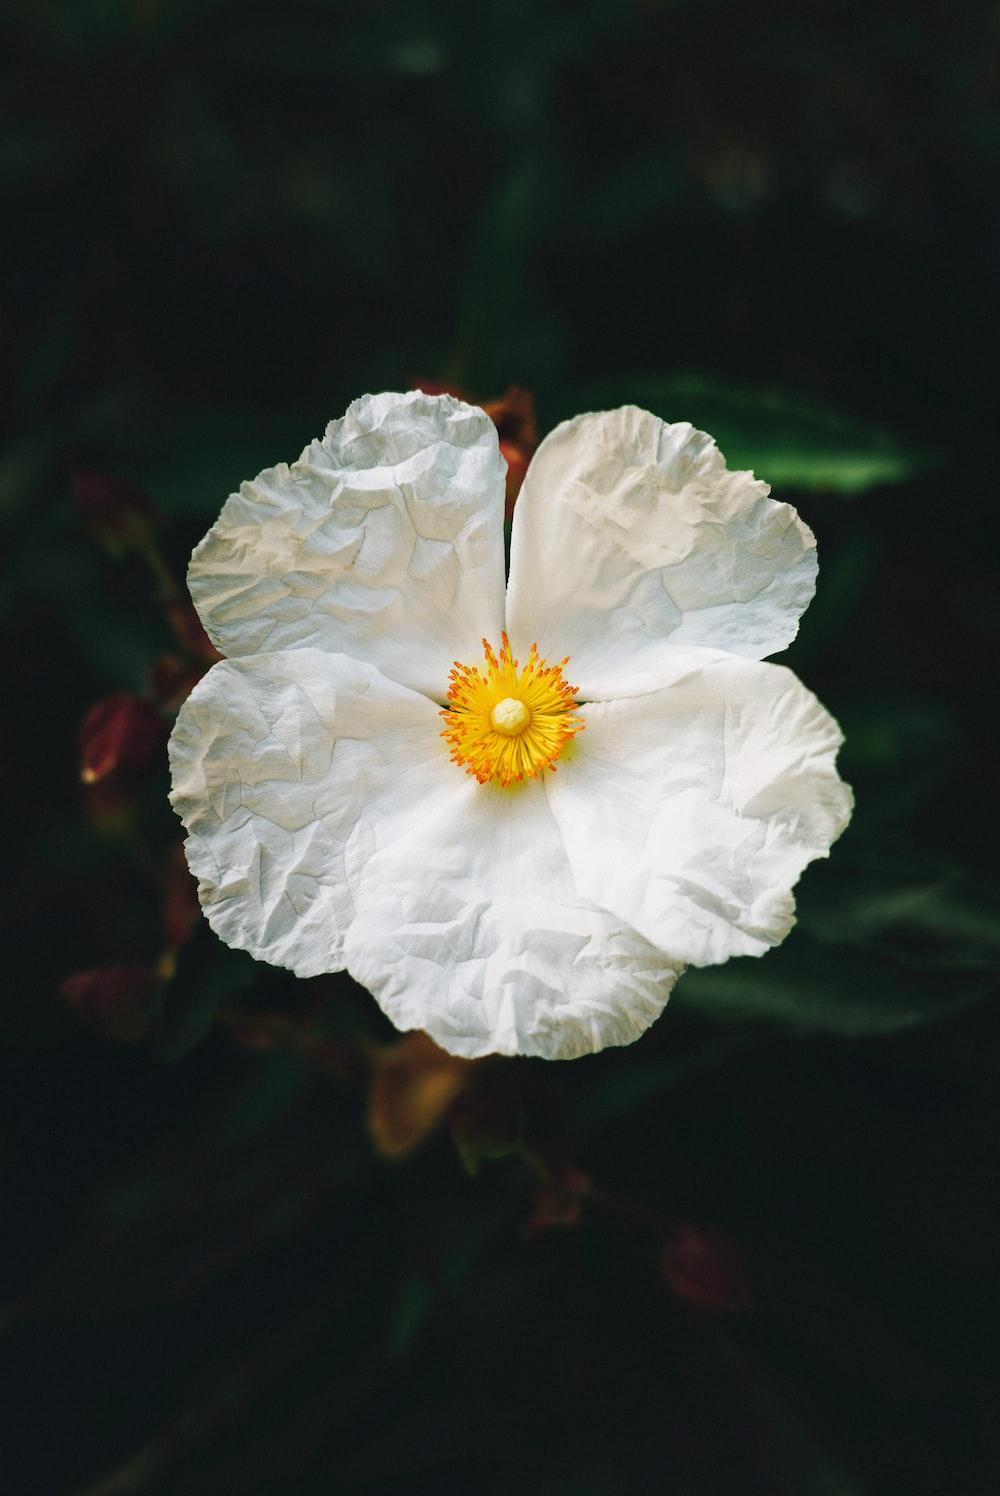 shallow focus photo of white petaled flower